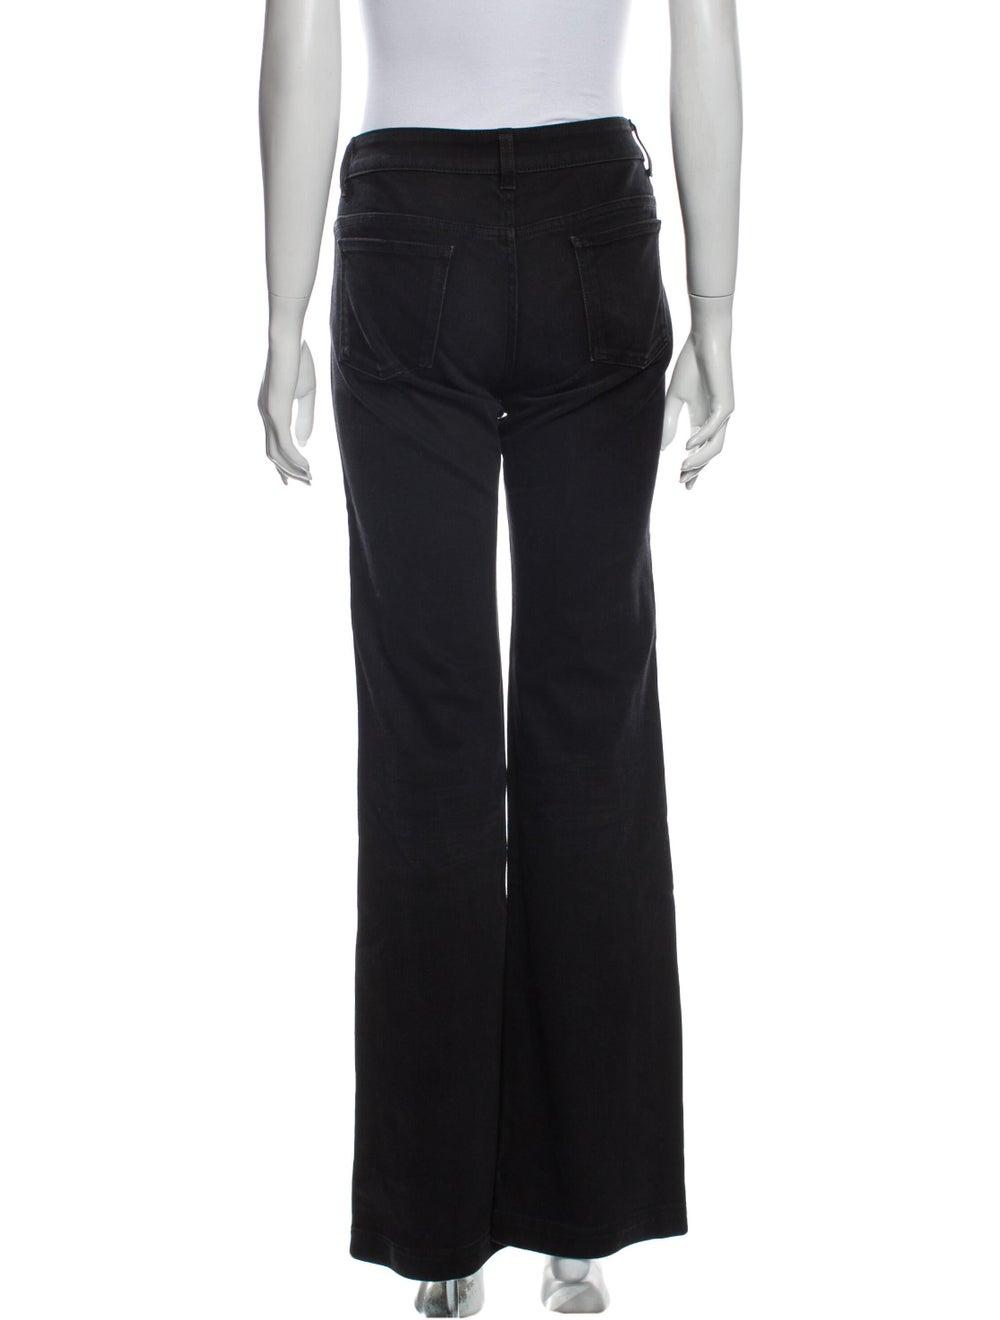 Gucci 70's Wide Leg Jeans Black - image 3